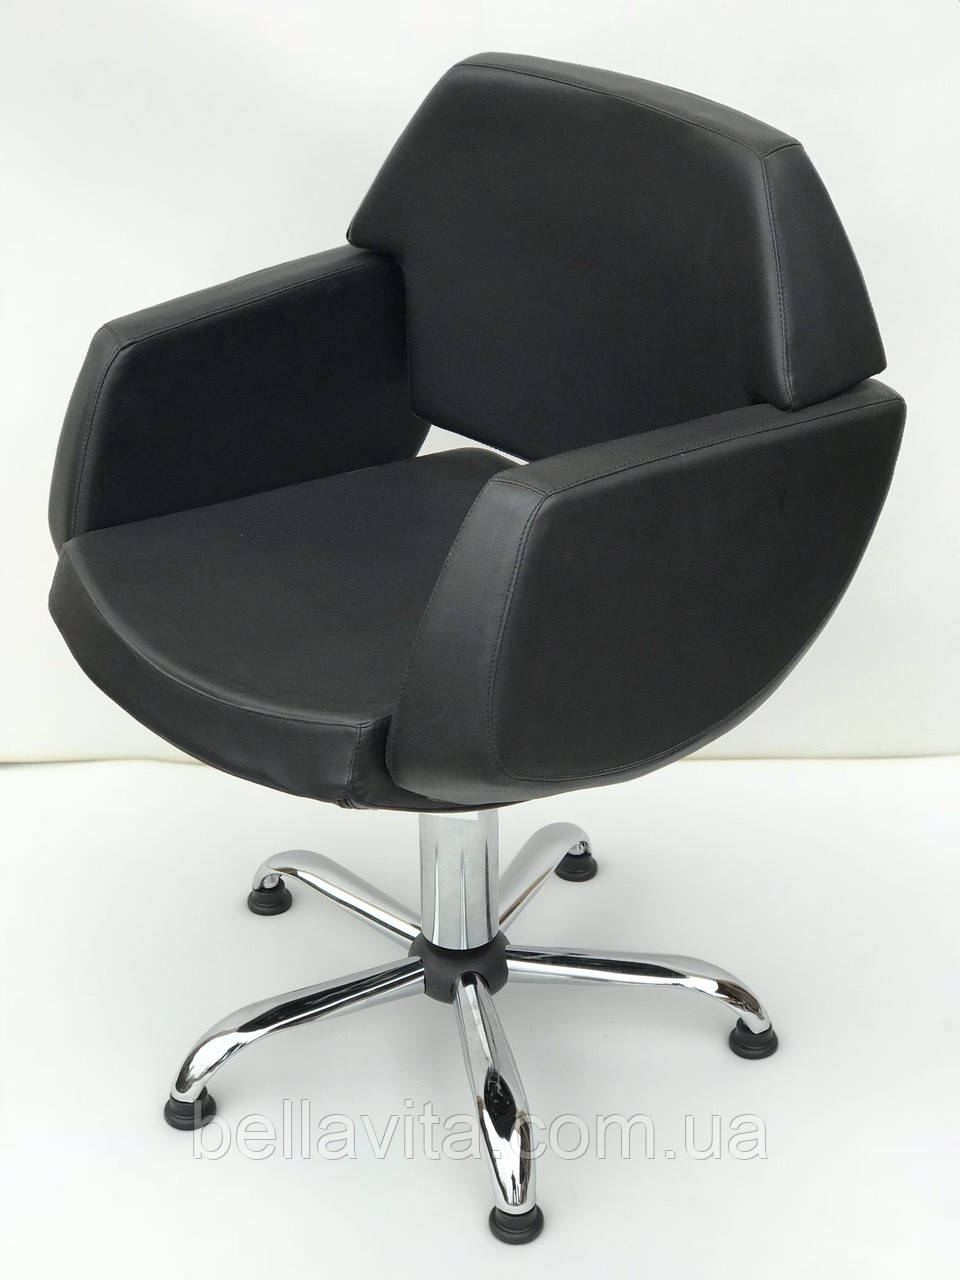 Перукарське крісло Imperia